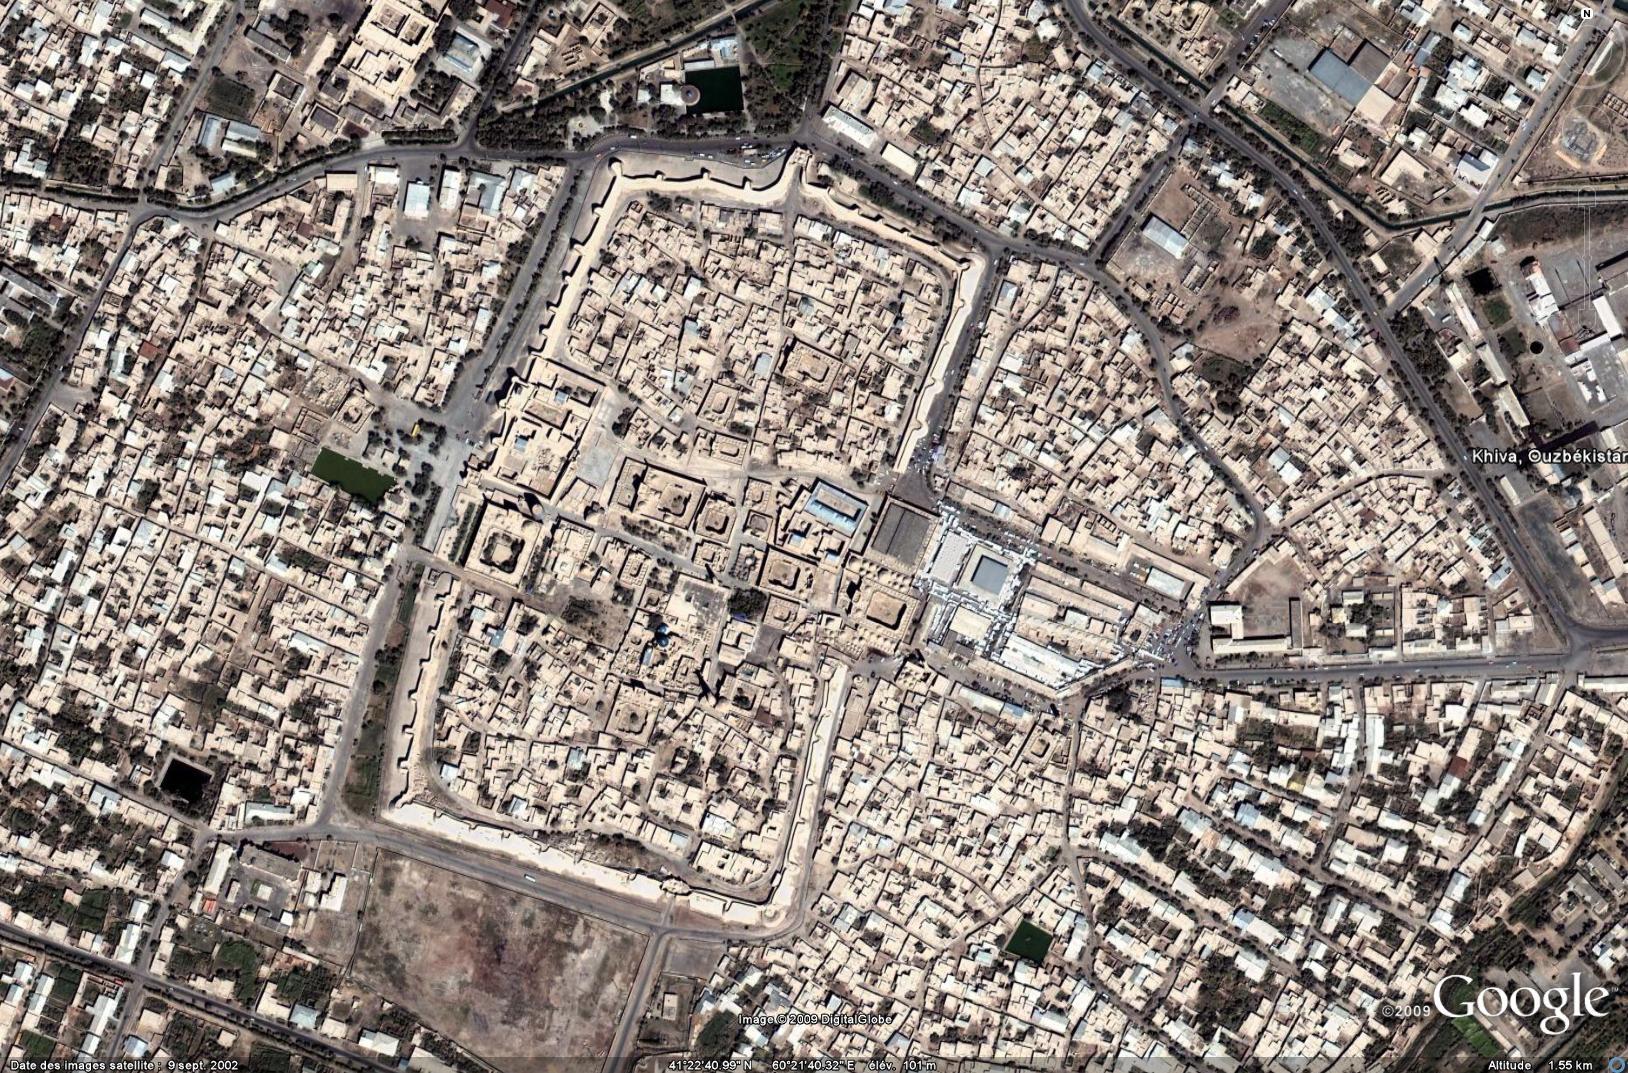 Khiva, Google Earth